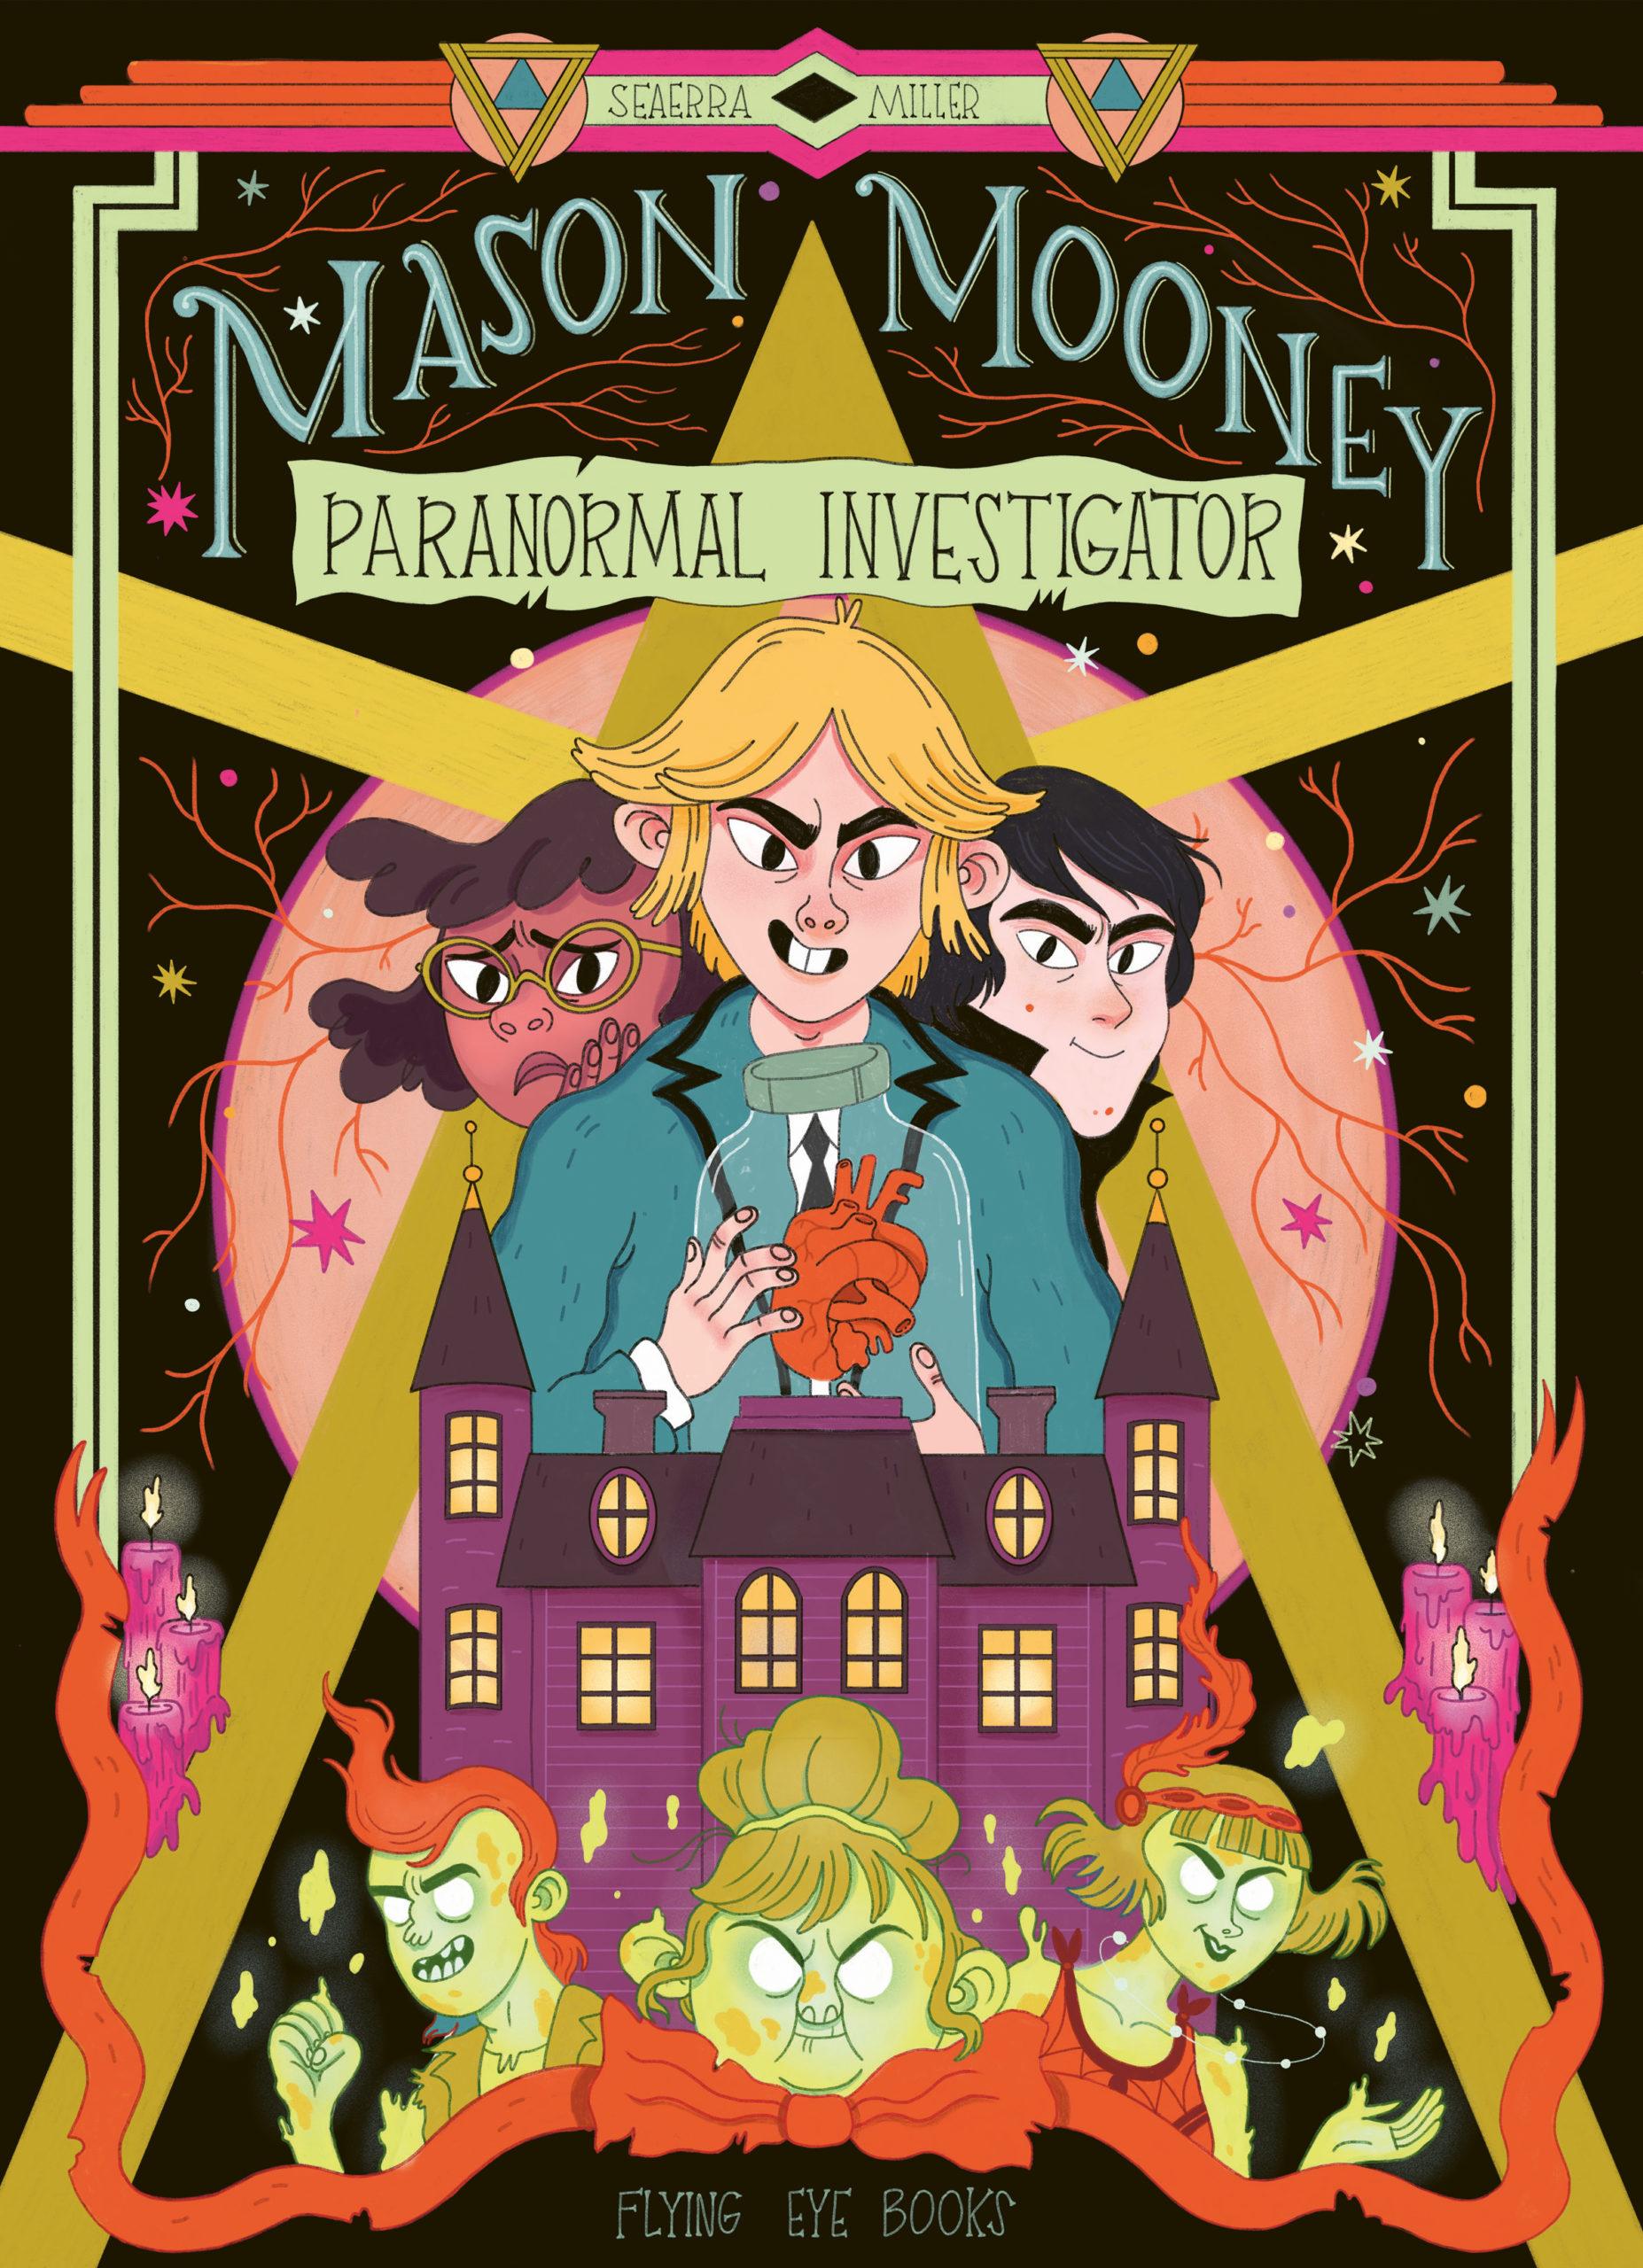 Book cover - Mason Mooney: Paranormal Investigator by Seaerra Miller.